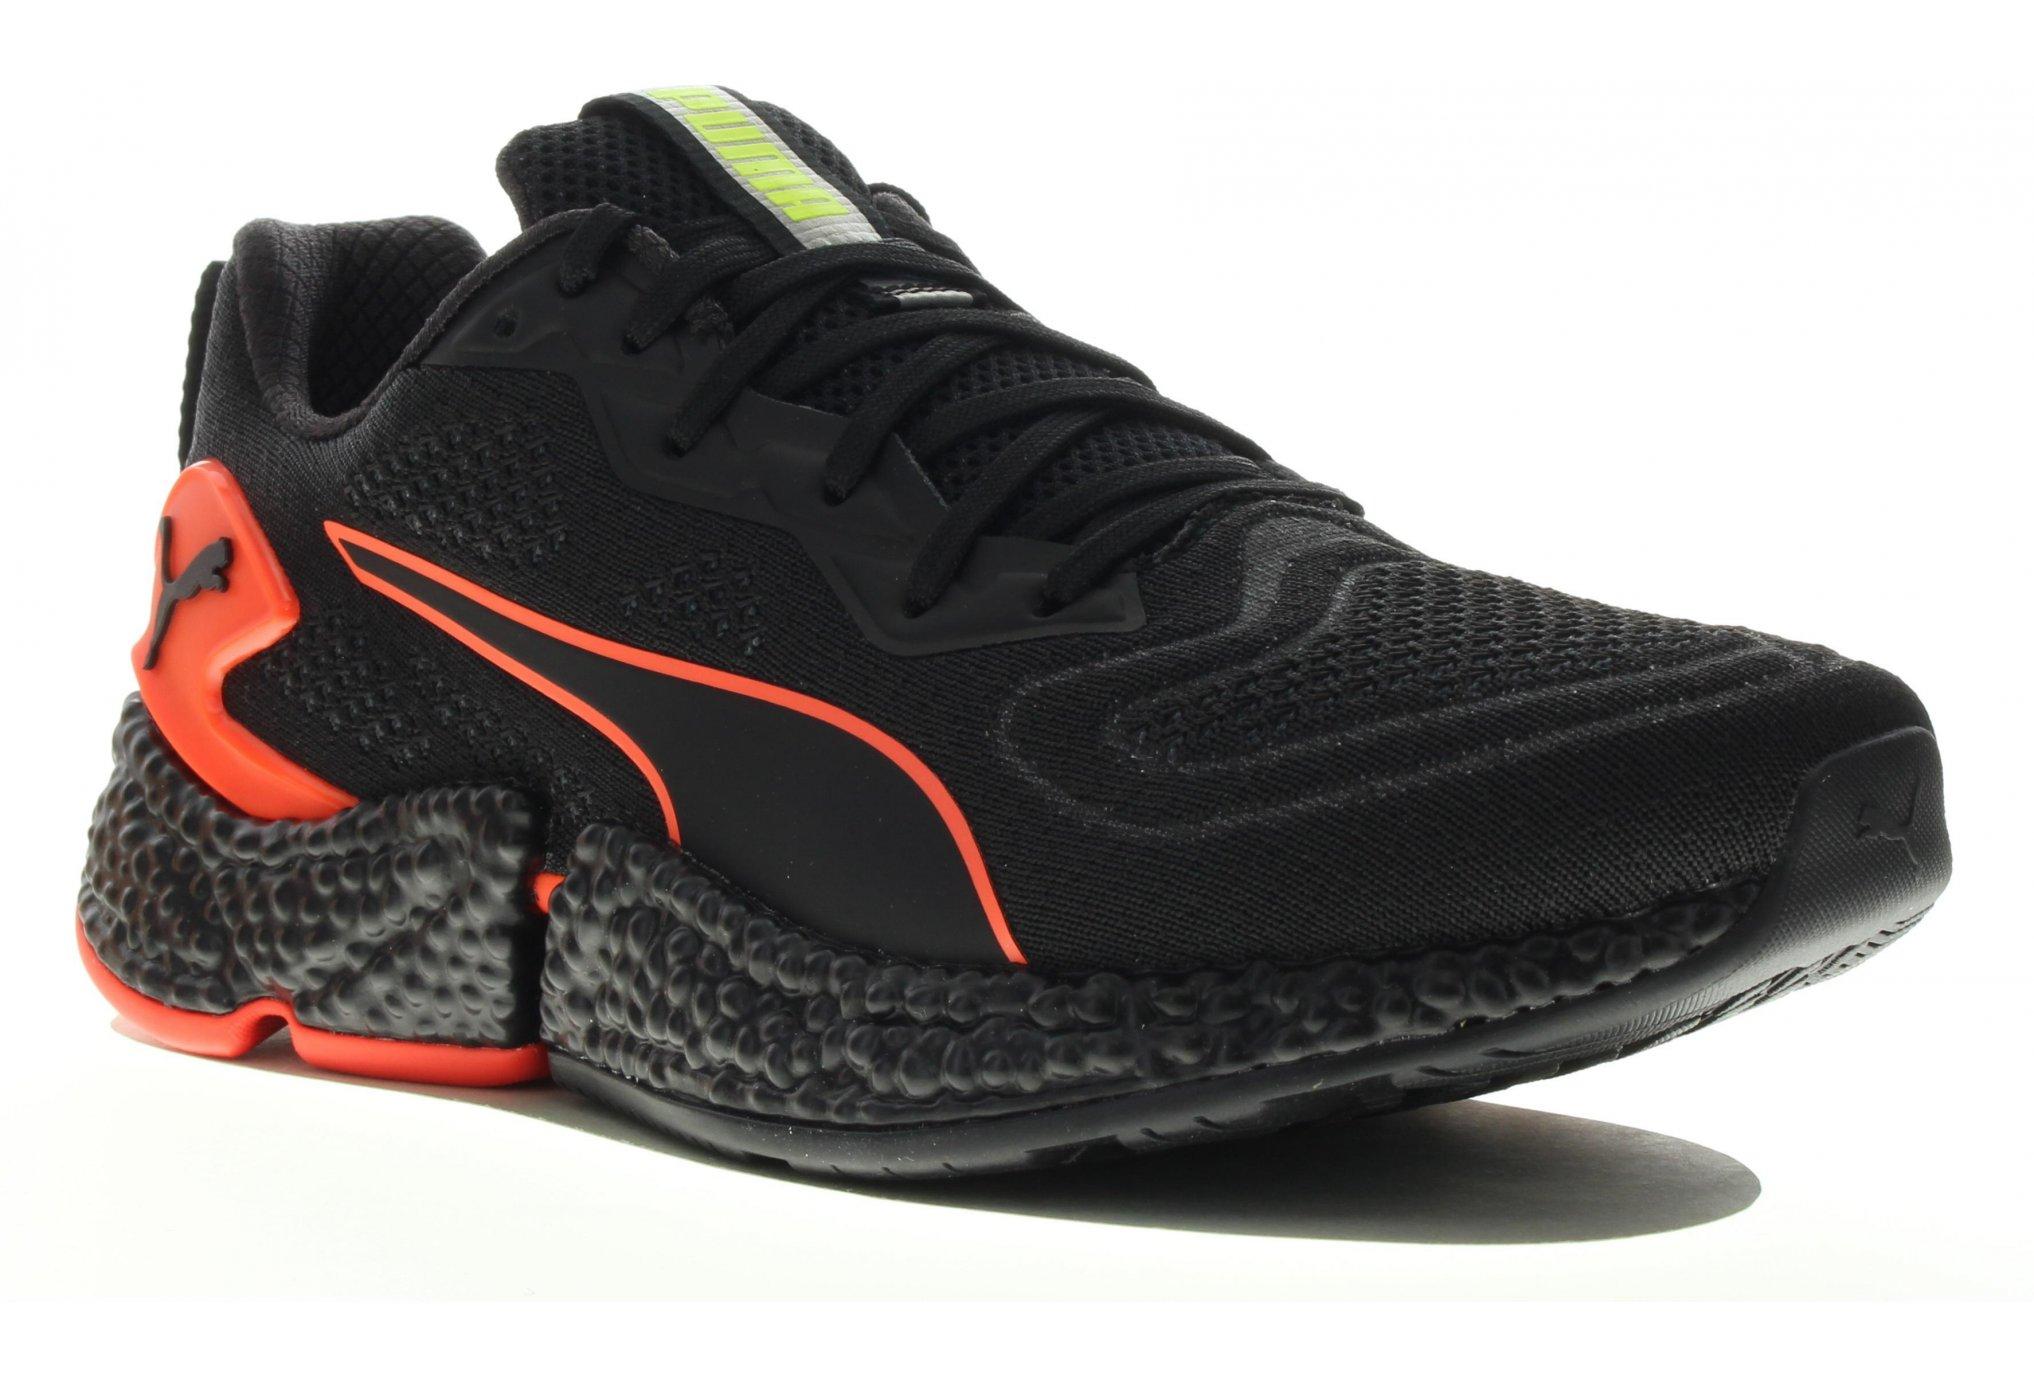 Puma Speed Orbiter M Diététique Chaussures homme